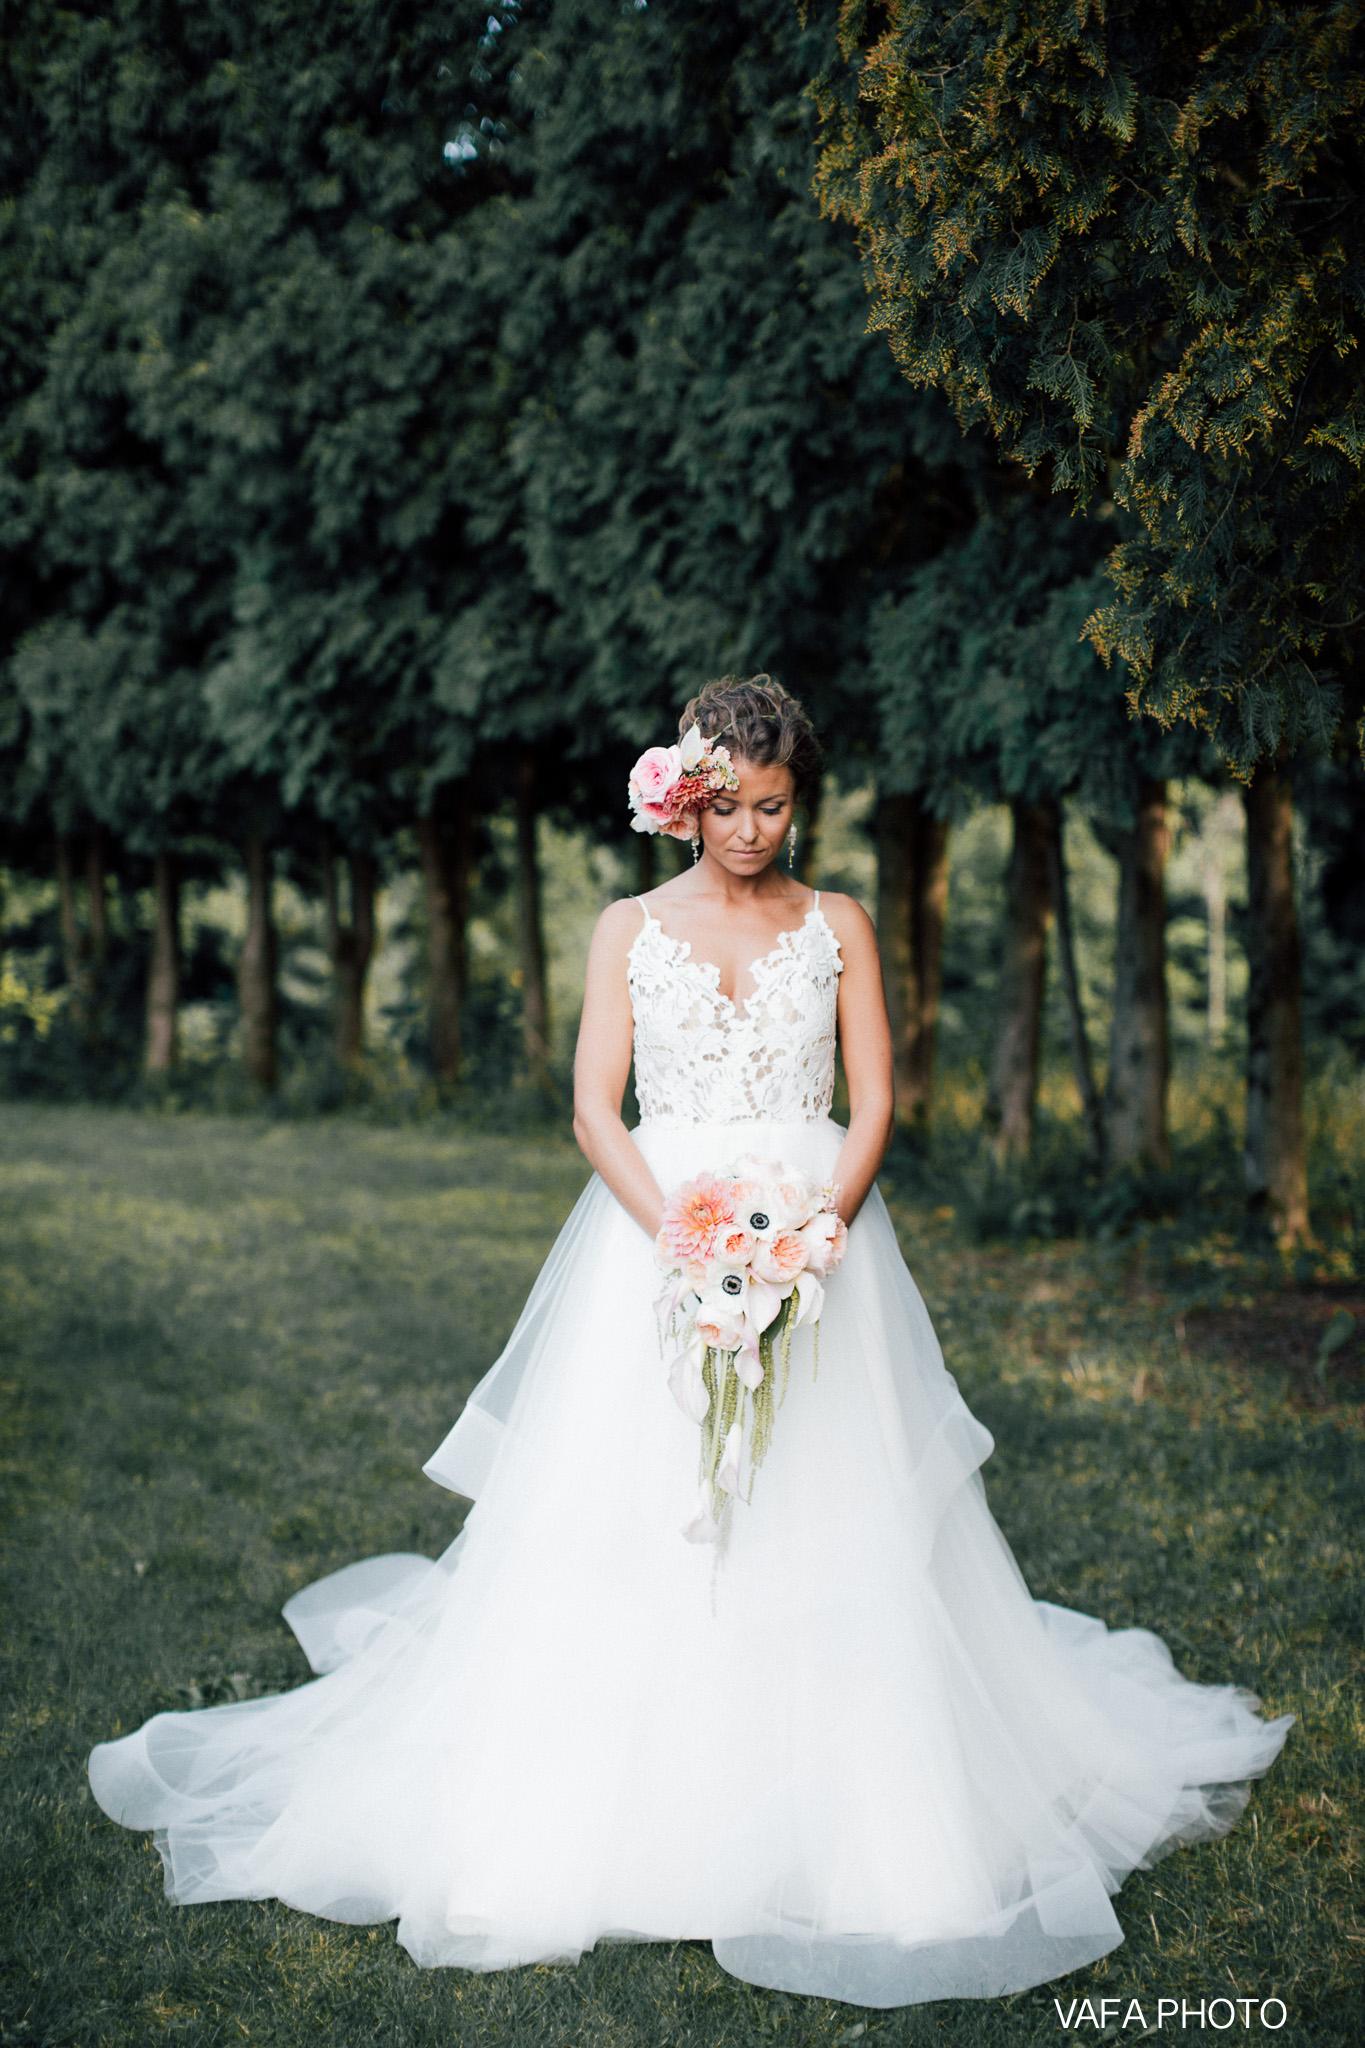 The-Felt-Estate-Wedding-Kailie-David-Vafa-Photo-698.jpg